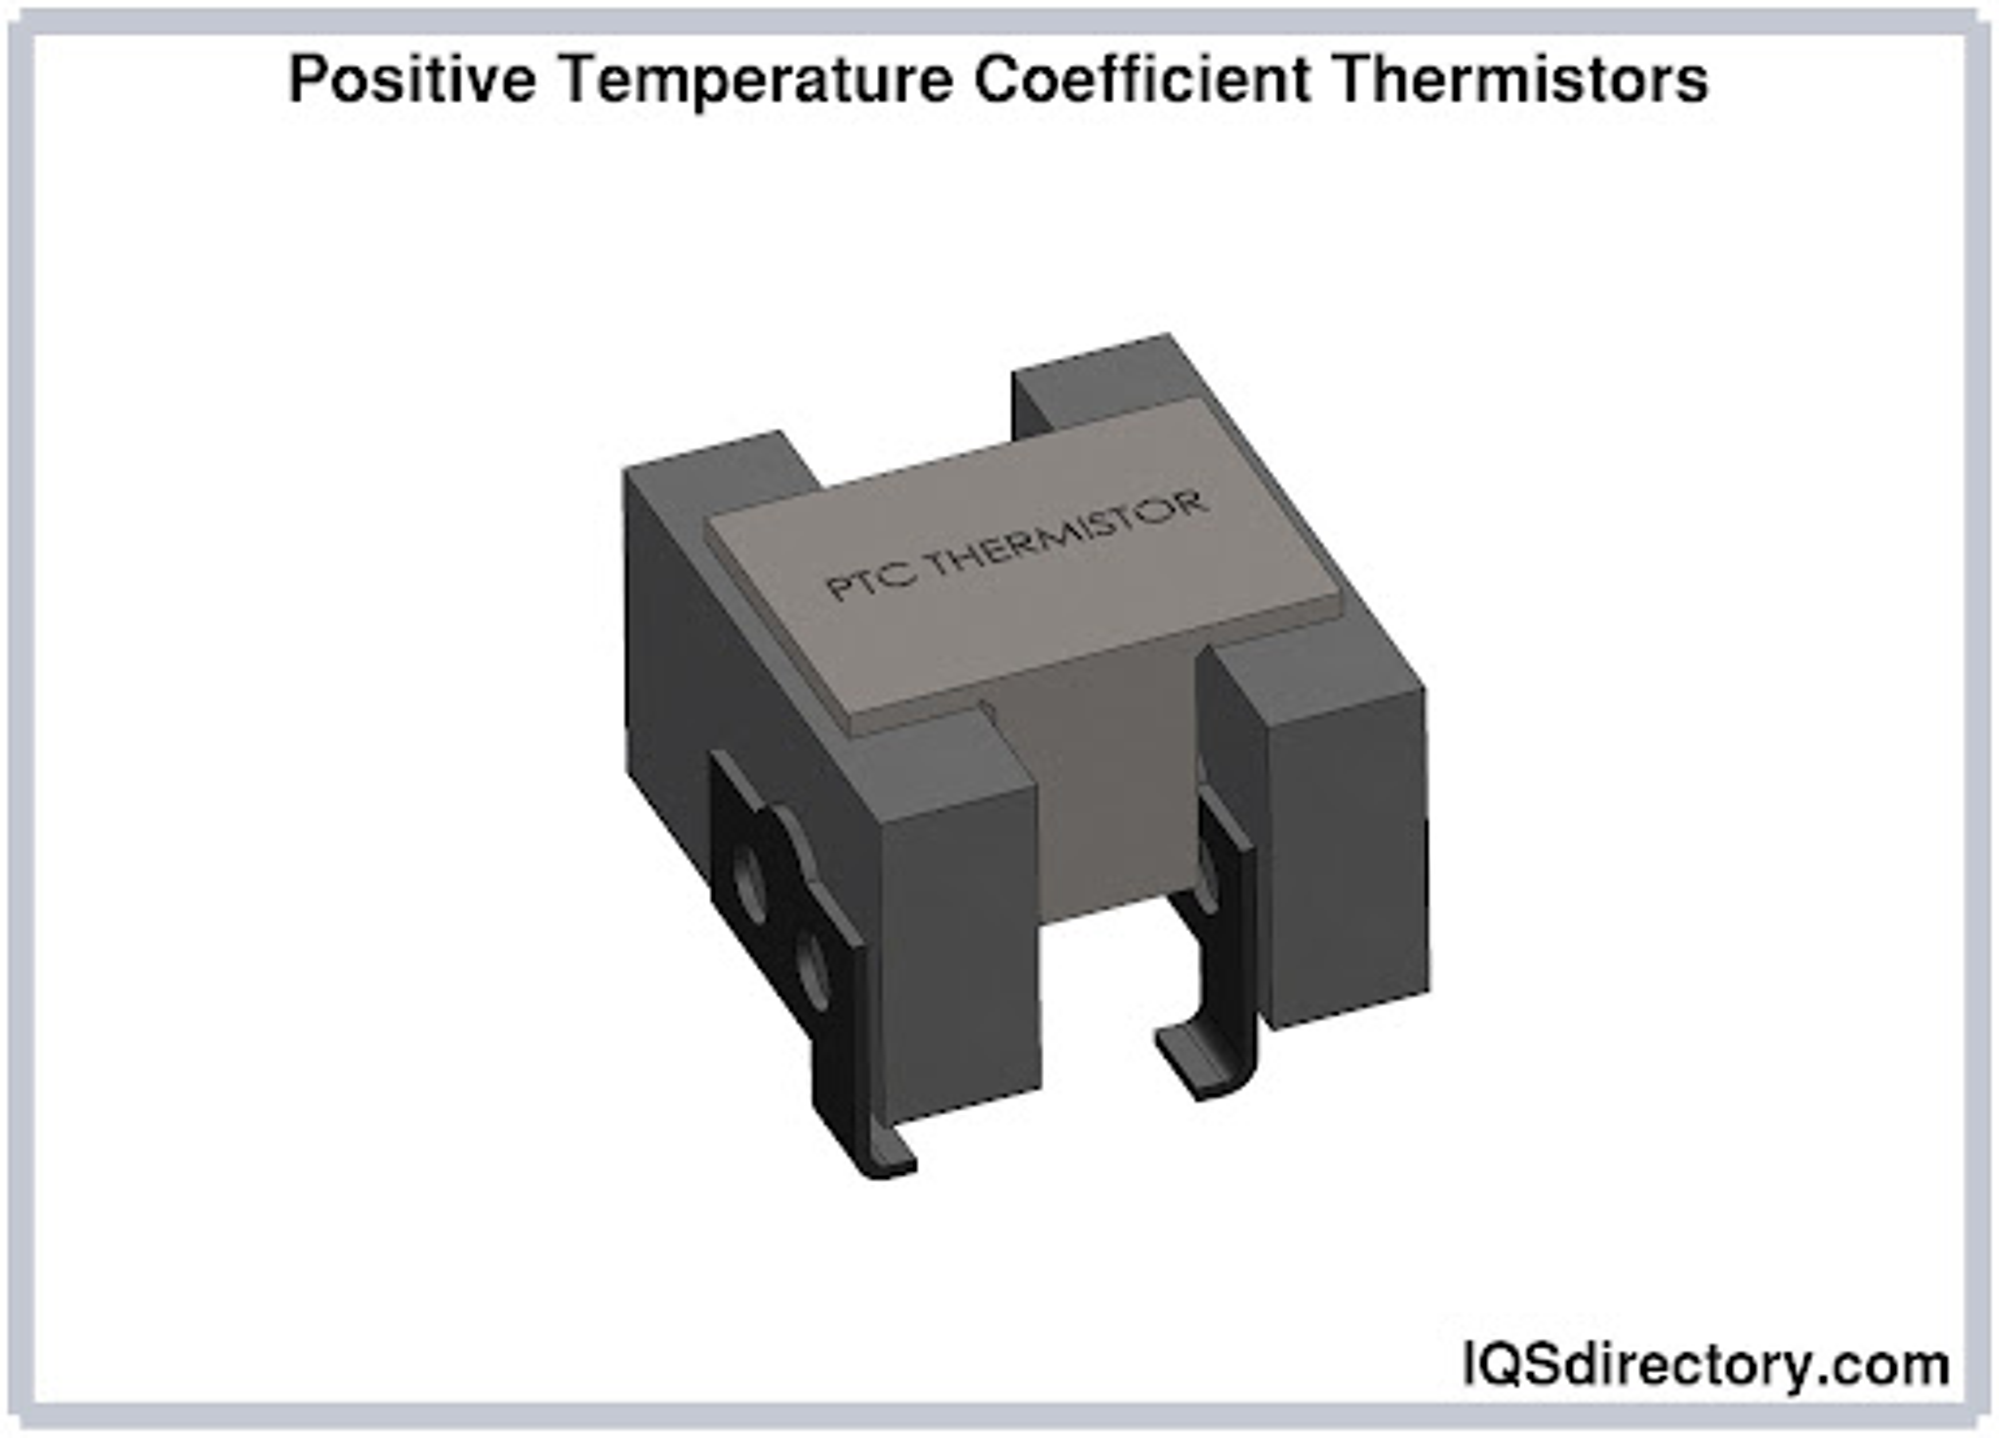 Positive Temperature Coefficient Thermistors